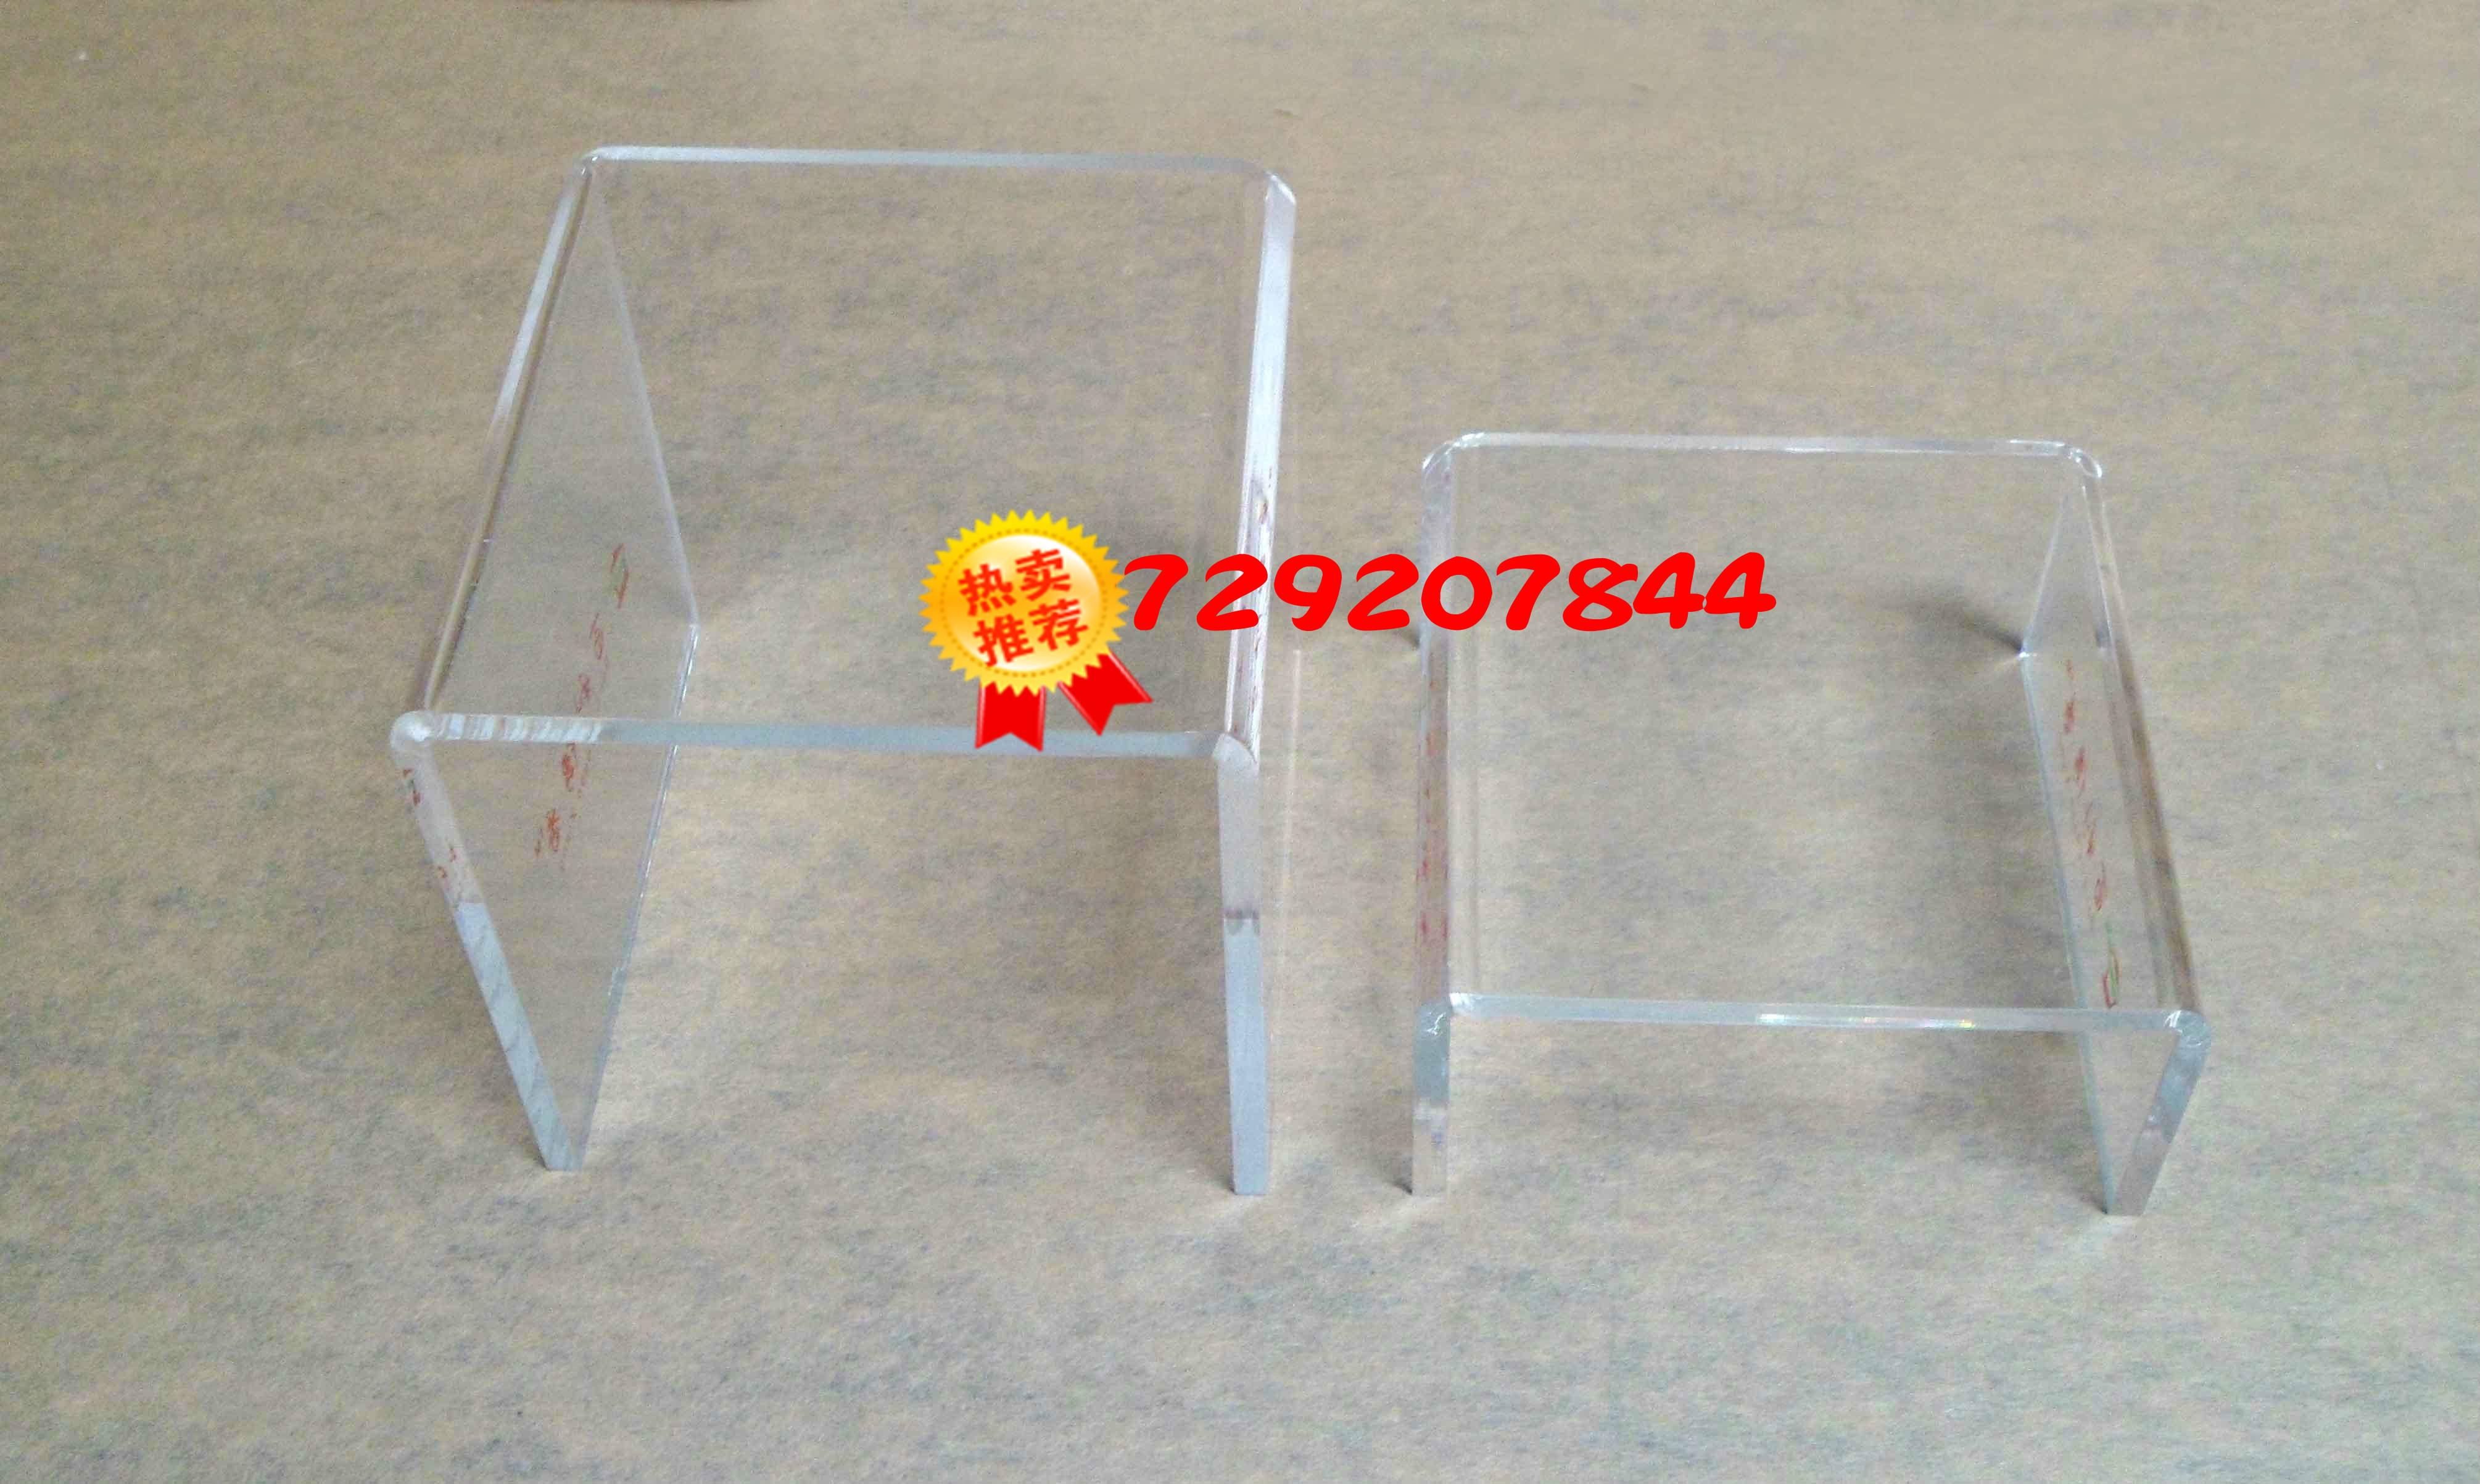 USD 7.29] Acrylic tea set display rack plexiglass U-frame cupware ...